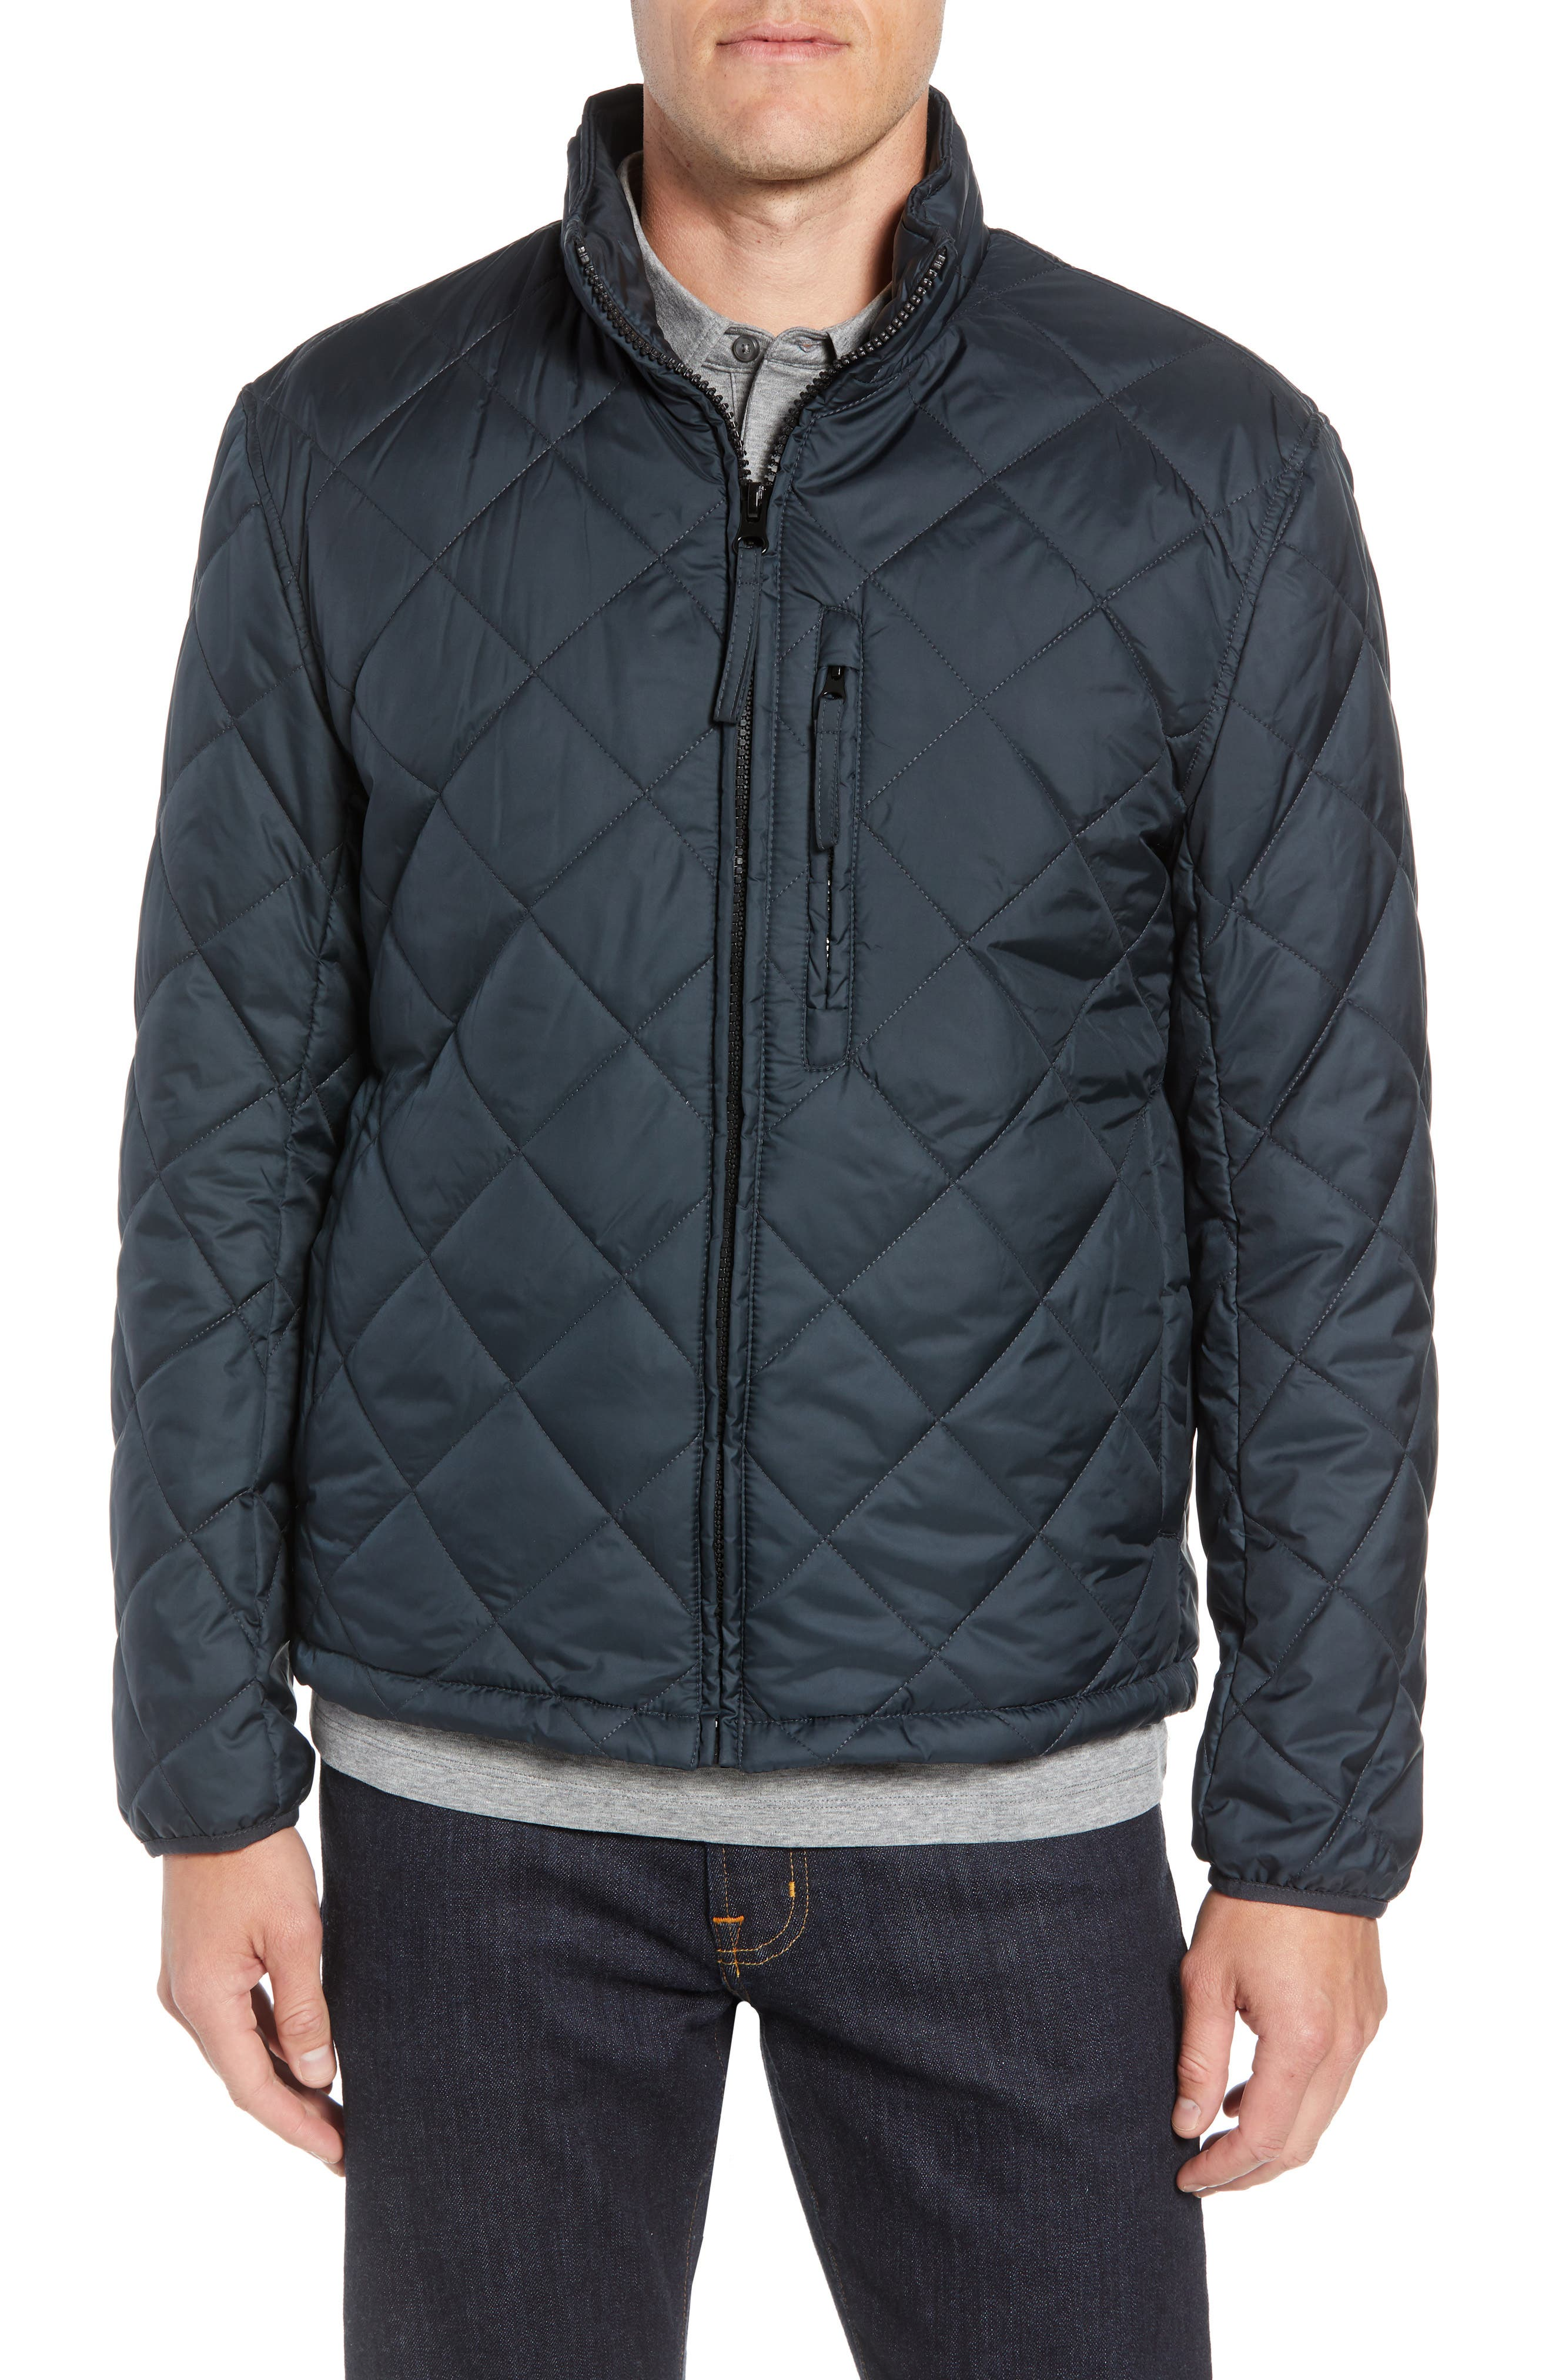 MARC NEW YORK, Humboldt Quilted Jacket, Alternate thumbnail 5, color, BLACK